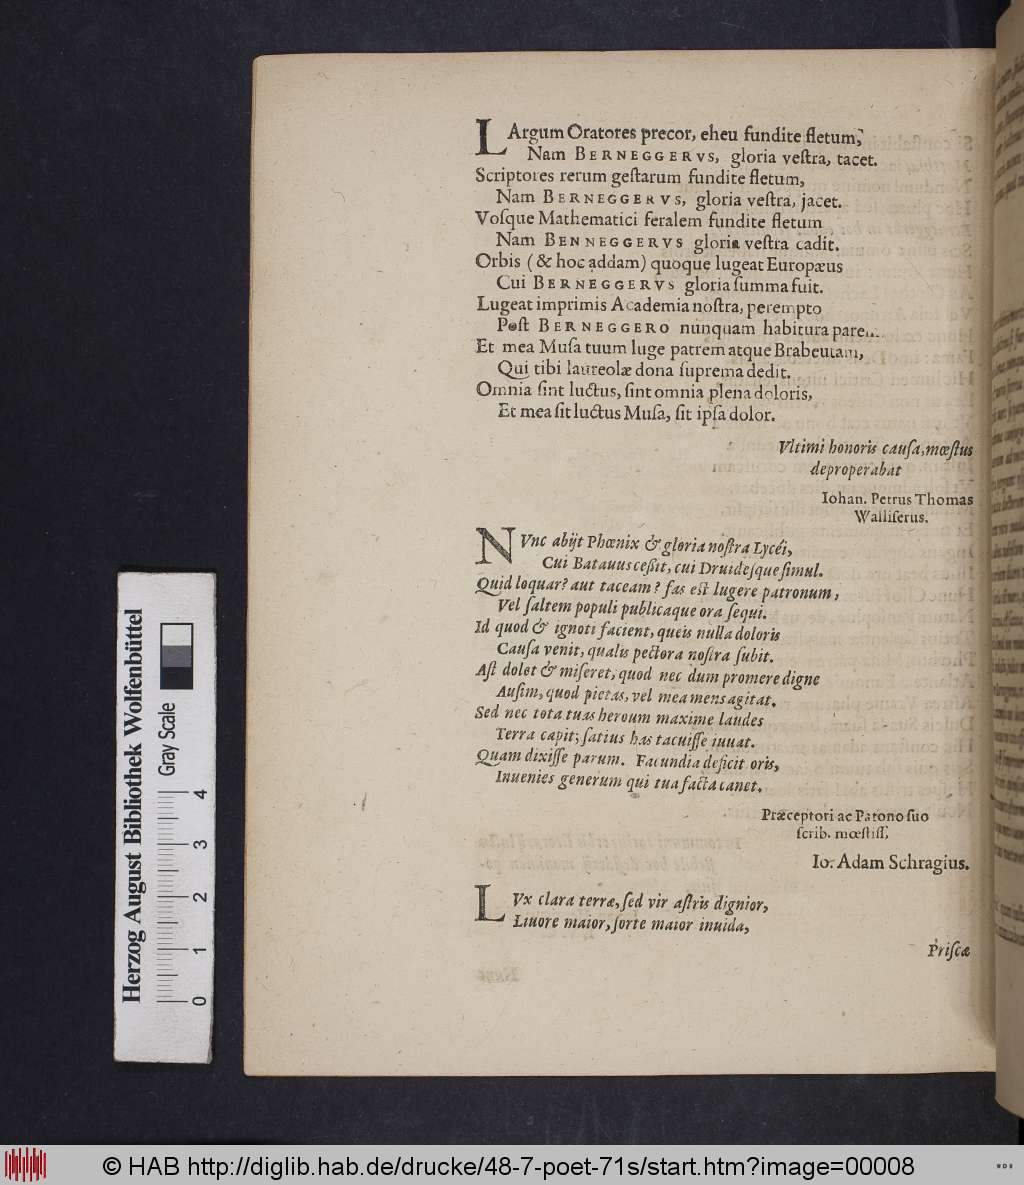 https://diglib.hab.de/drucke/48-7-poet-71s/00008.jpg